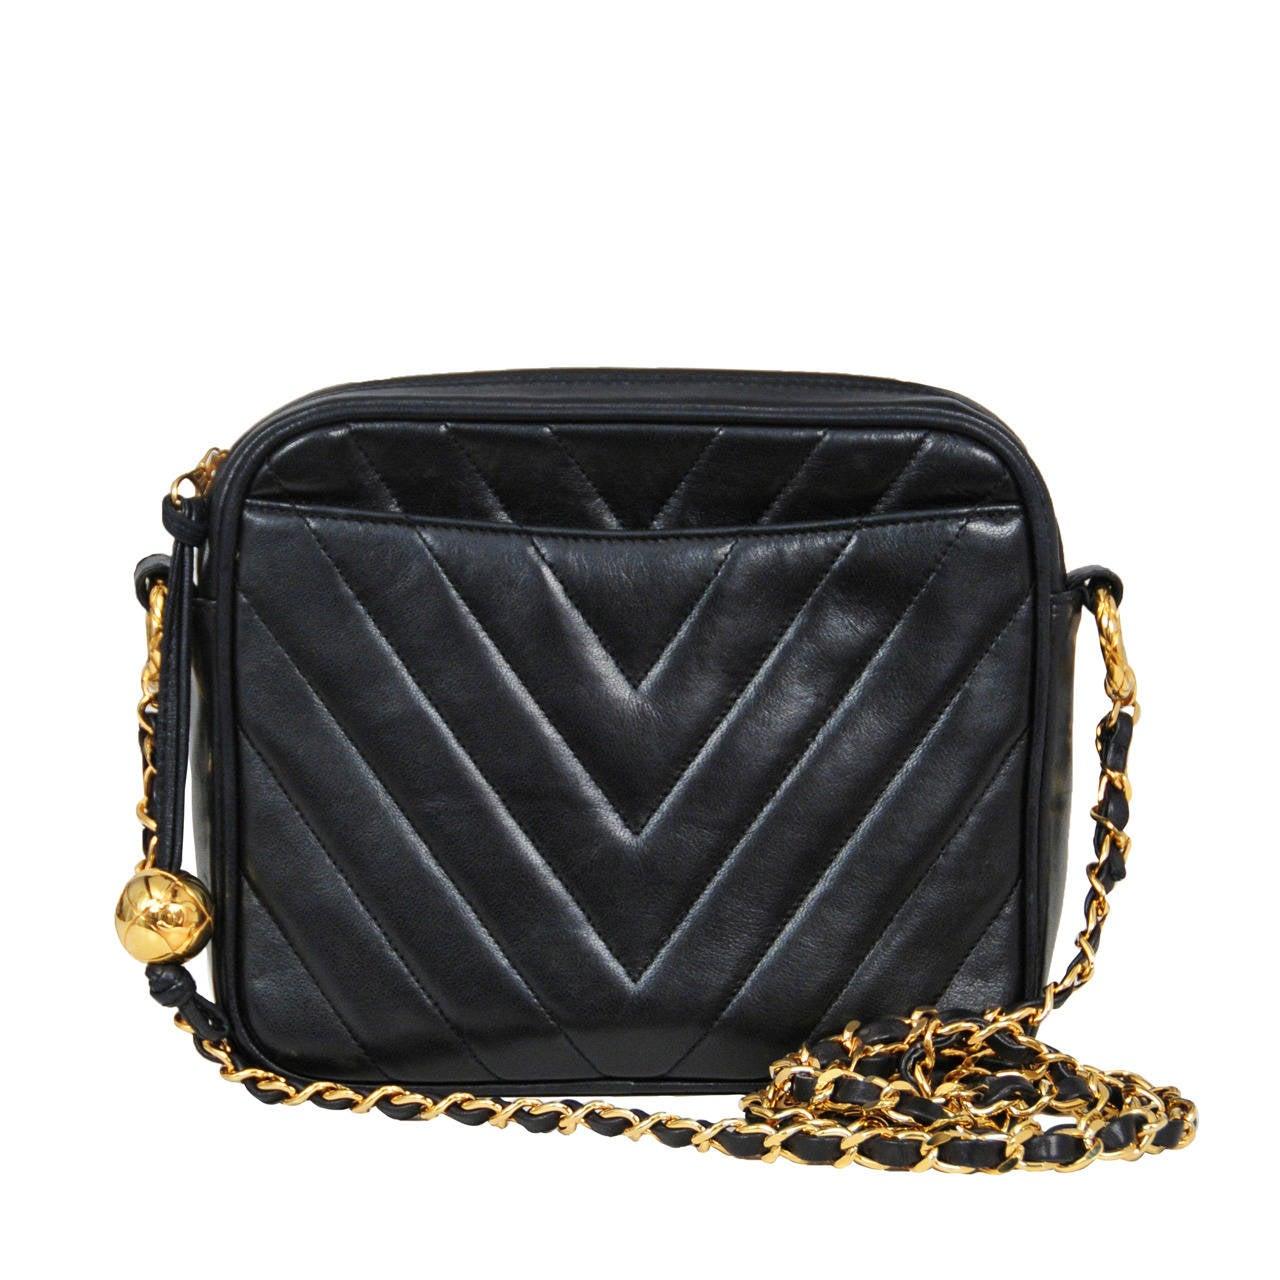 05da3895eb140d Chanel Chevron Stripe Crossbody Bag For Sale. Vintage Chanel black lambskin chevron  quilted ...